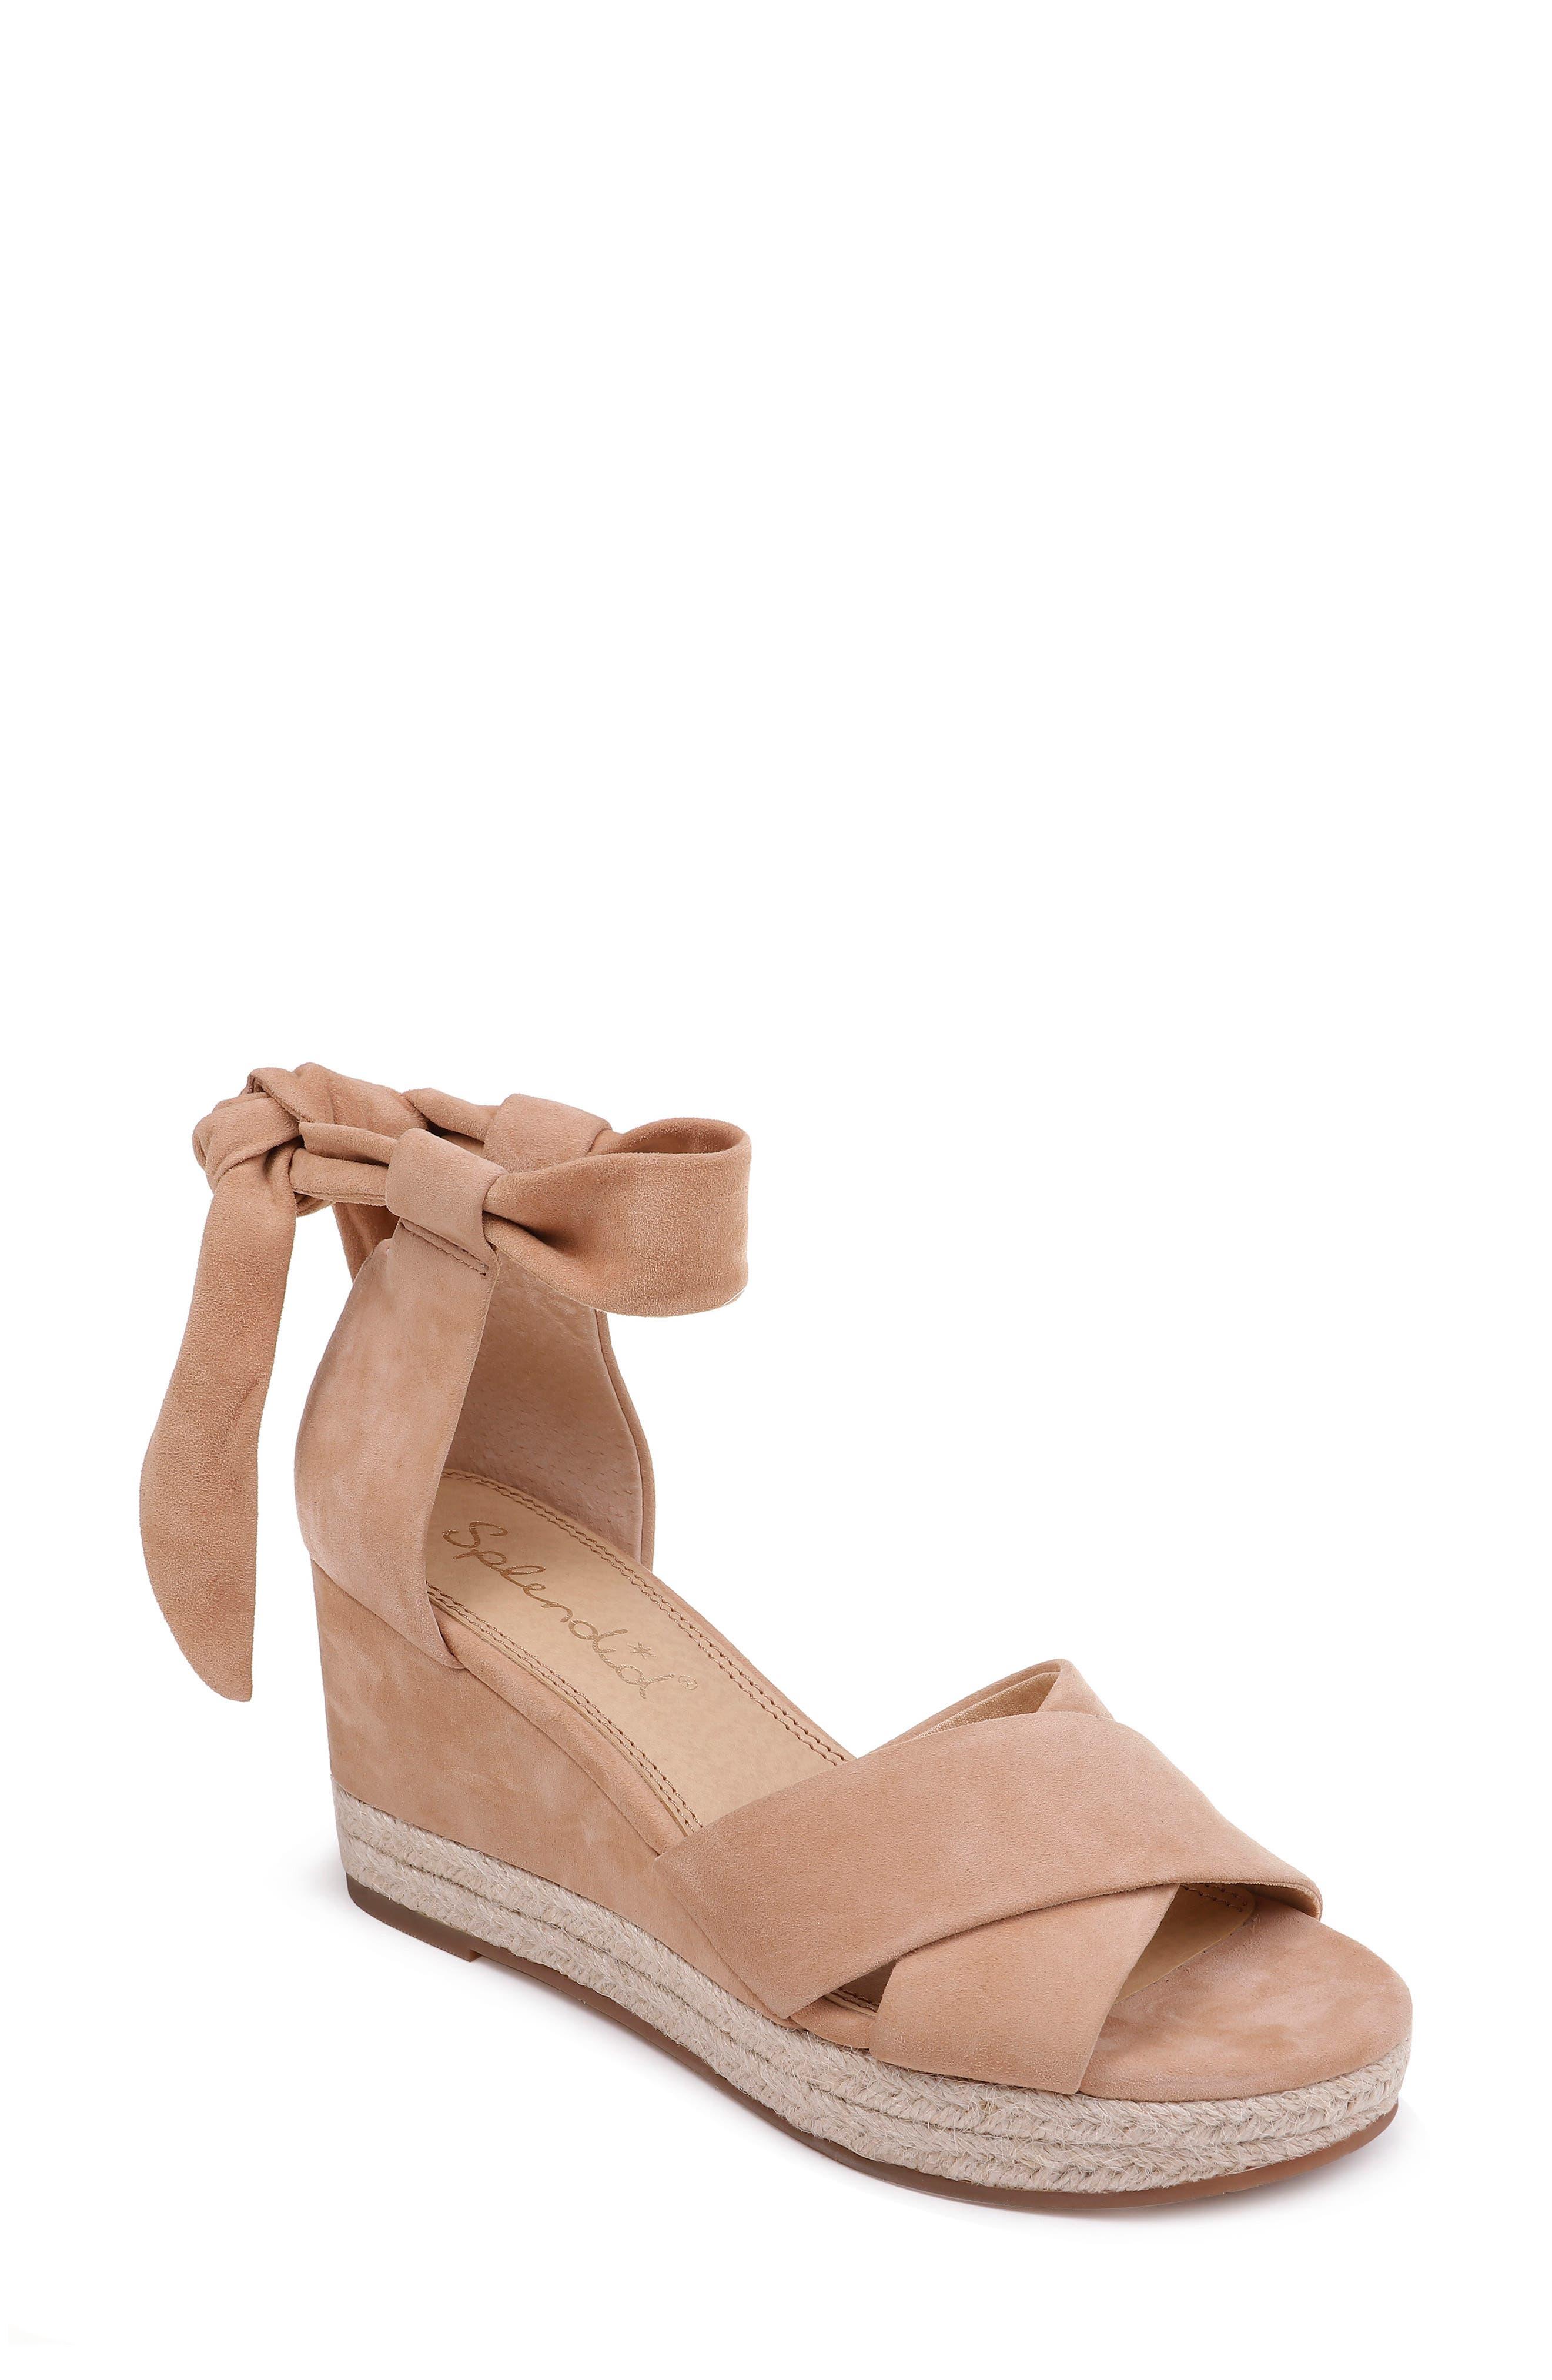 Splendid Terrence Ankle Wrap Wedge Sandal- Beige